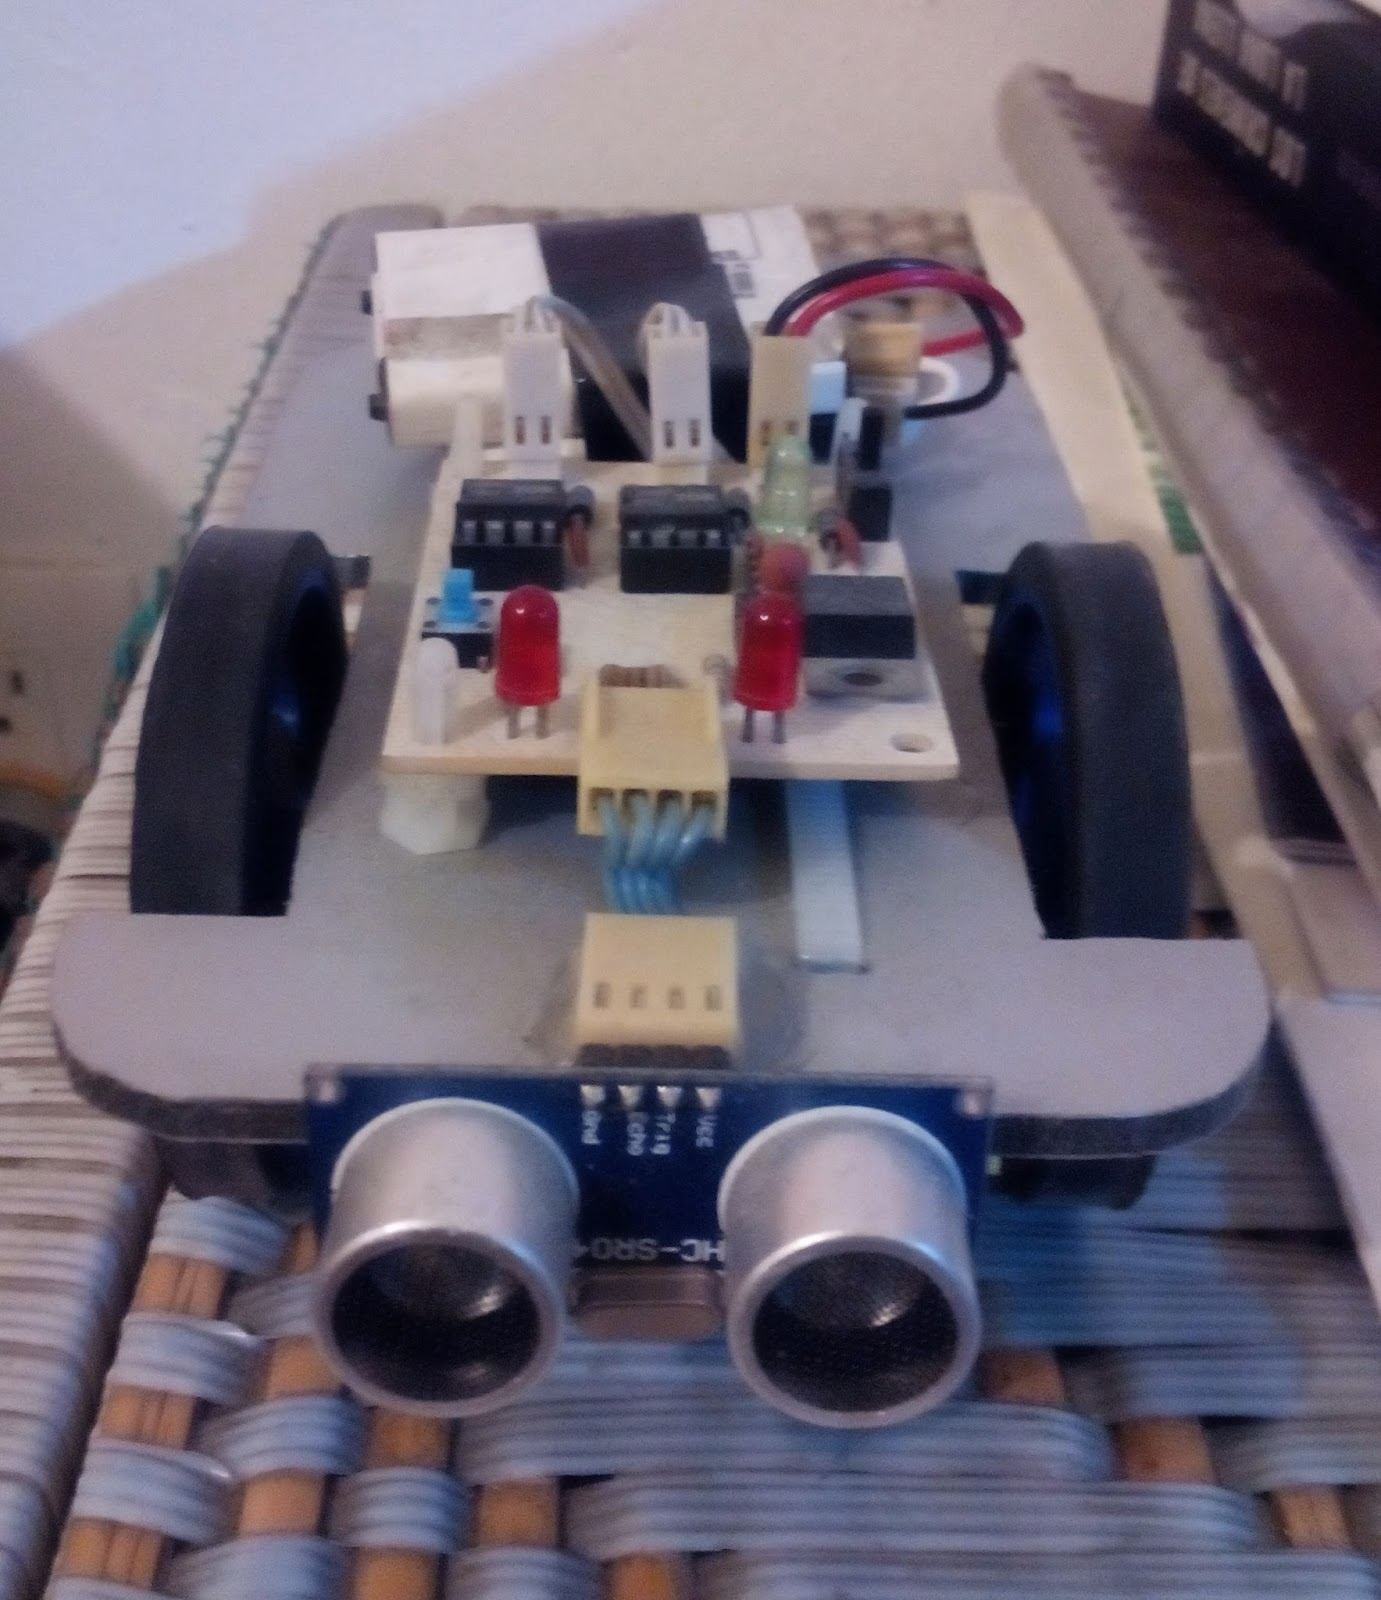 Robot que evita obstáculos v mrchunckuee